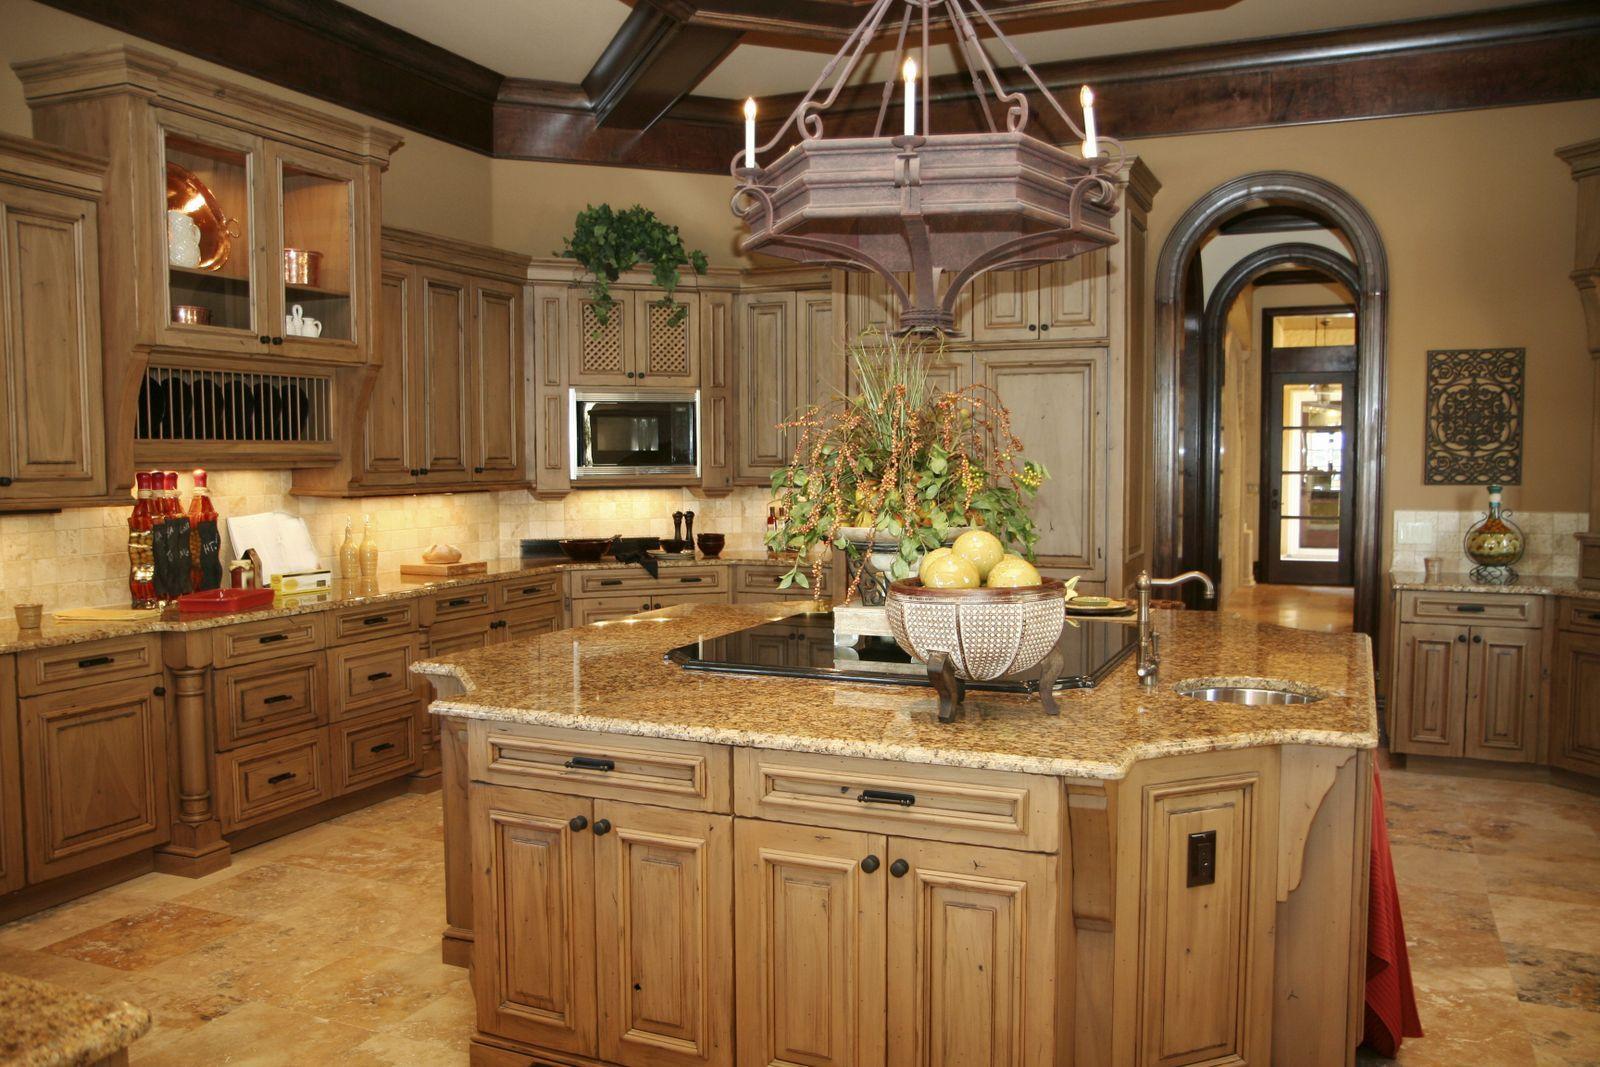 Granite Countertops Granite Countertops Beautify New Jersey For The Home